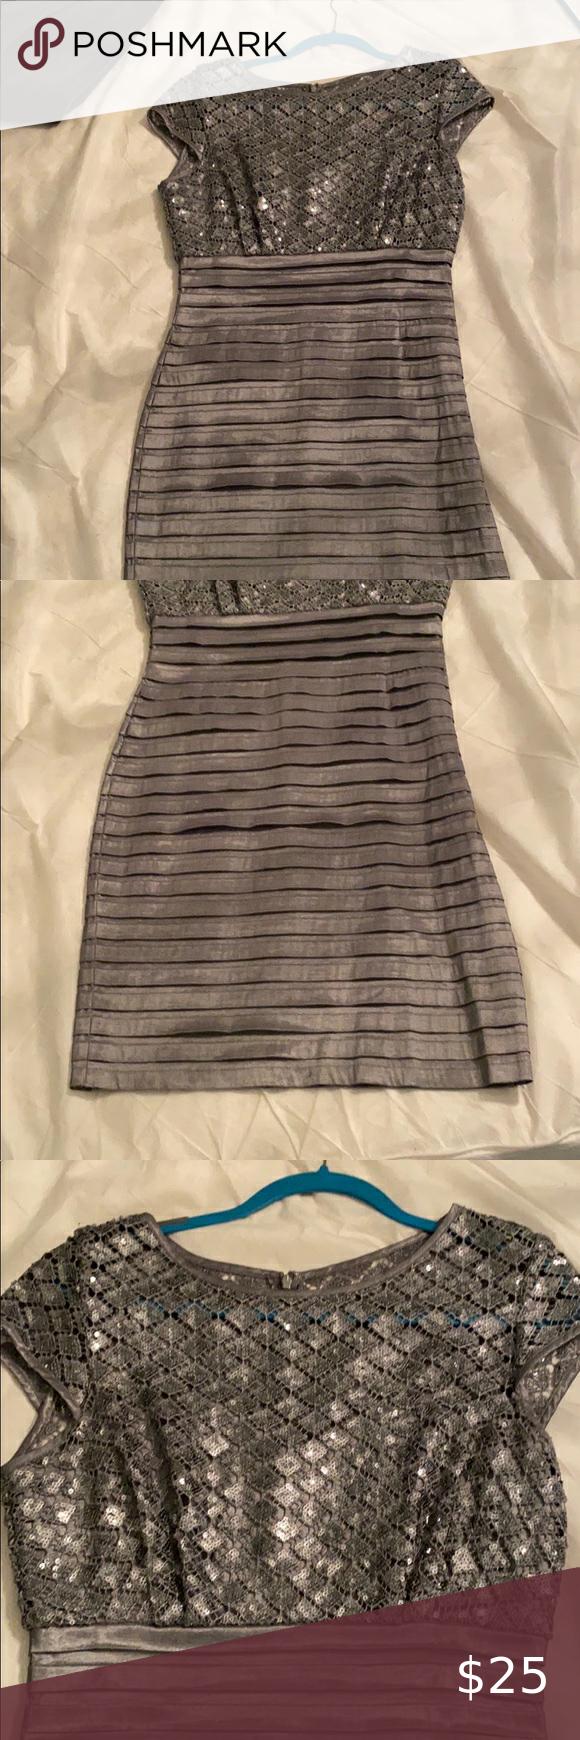 Sparkly Silver Dress Knee Length Knee Length Dresses Silver Dress Von Maur Dresses [ 1740 x 580 Pixel ]